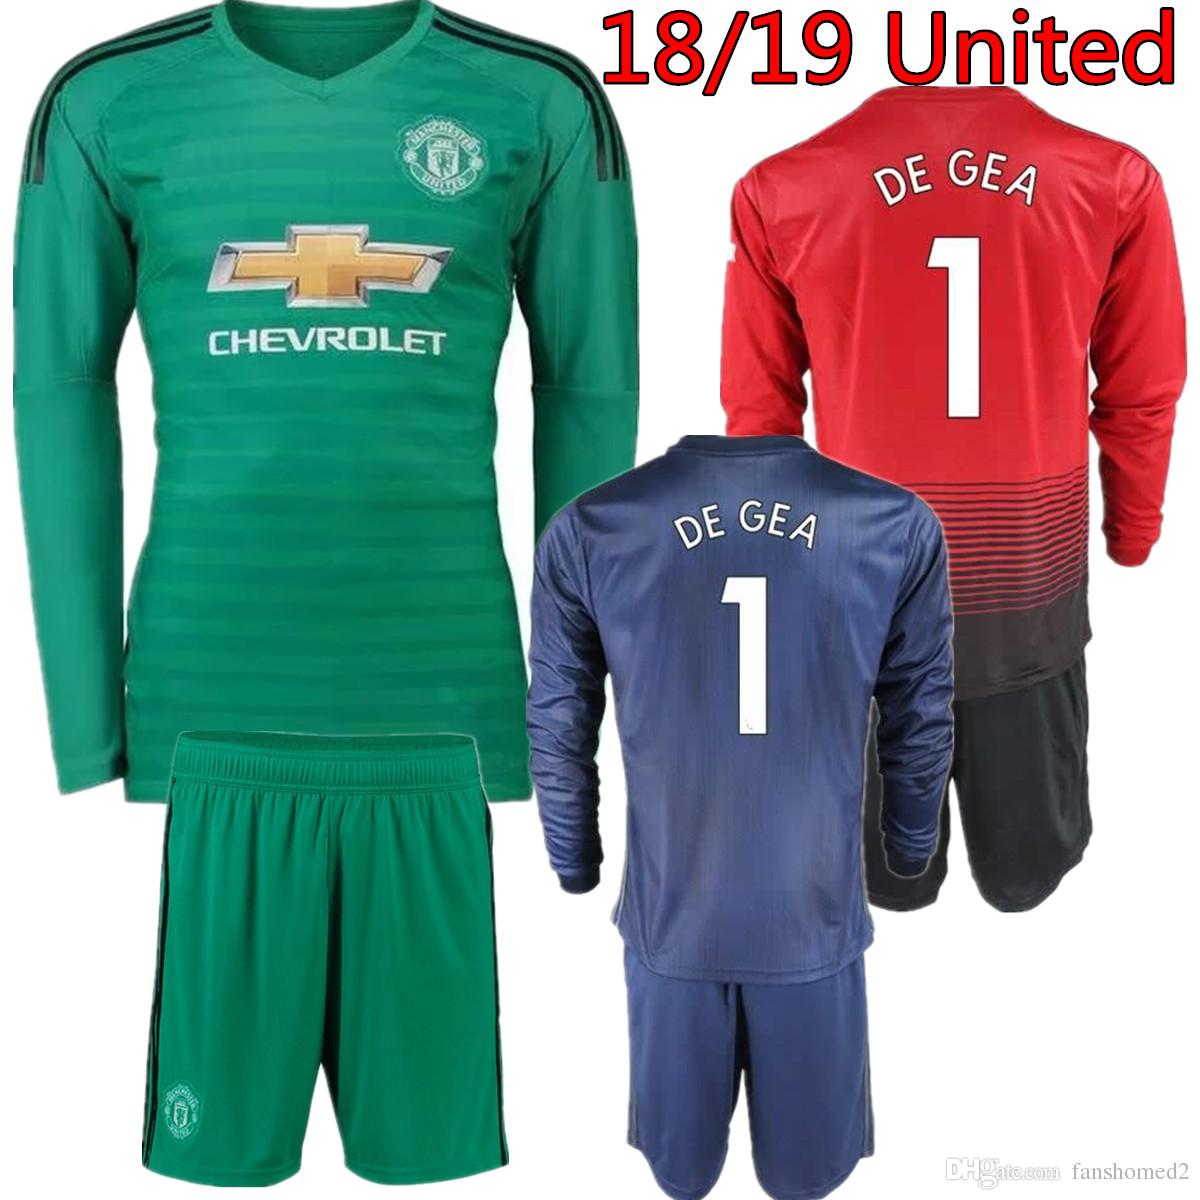 ... Camiseta De Fútbol Para Portero 18 19 Camiseta De David De Gea Romero  Green United Adultos Uniforme De Fútbol Completo A  23.63 Del Fanshomed2  21ab44876fce9